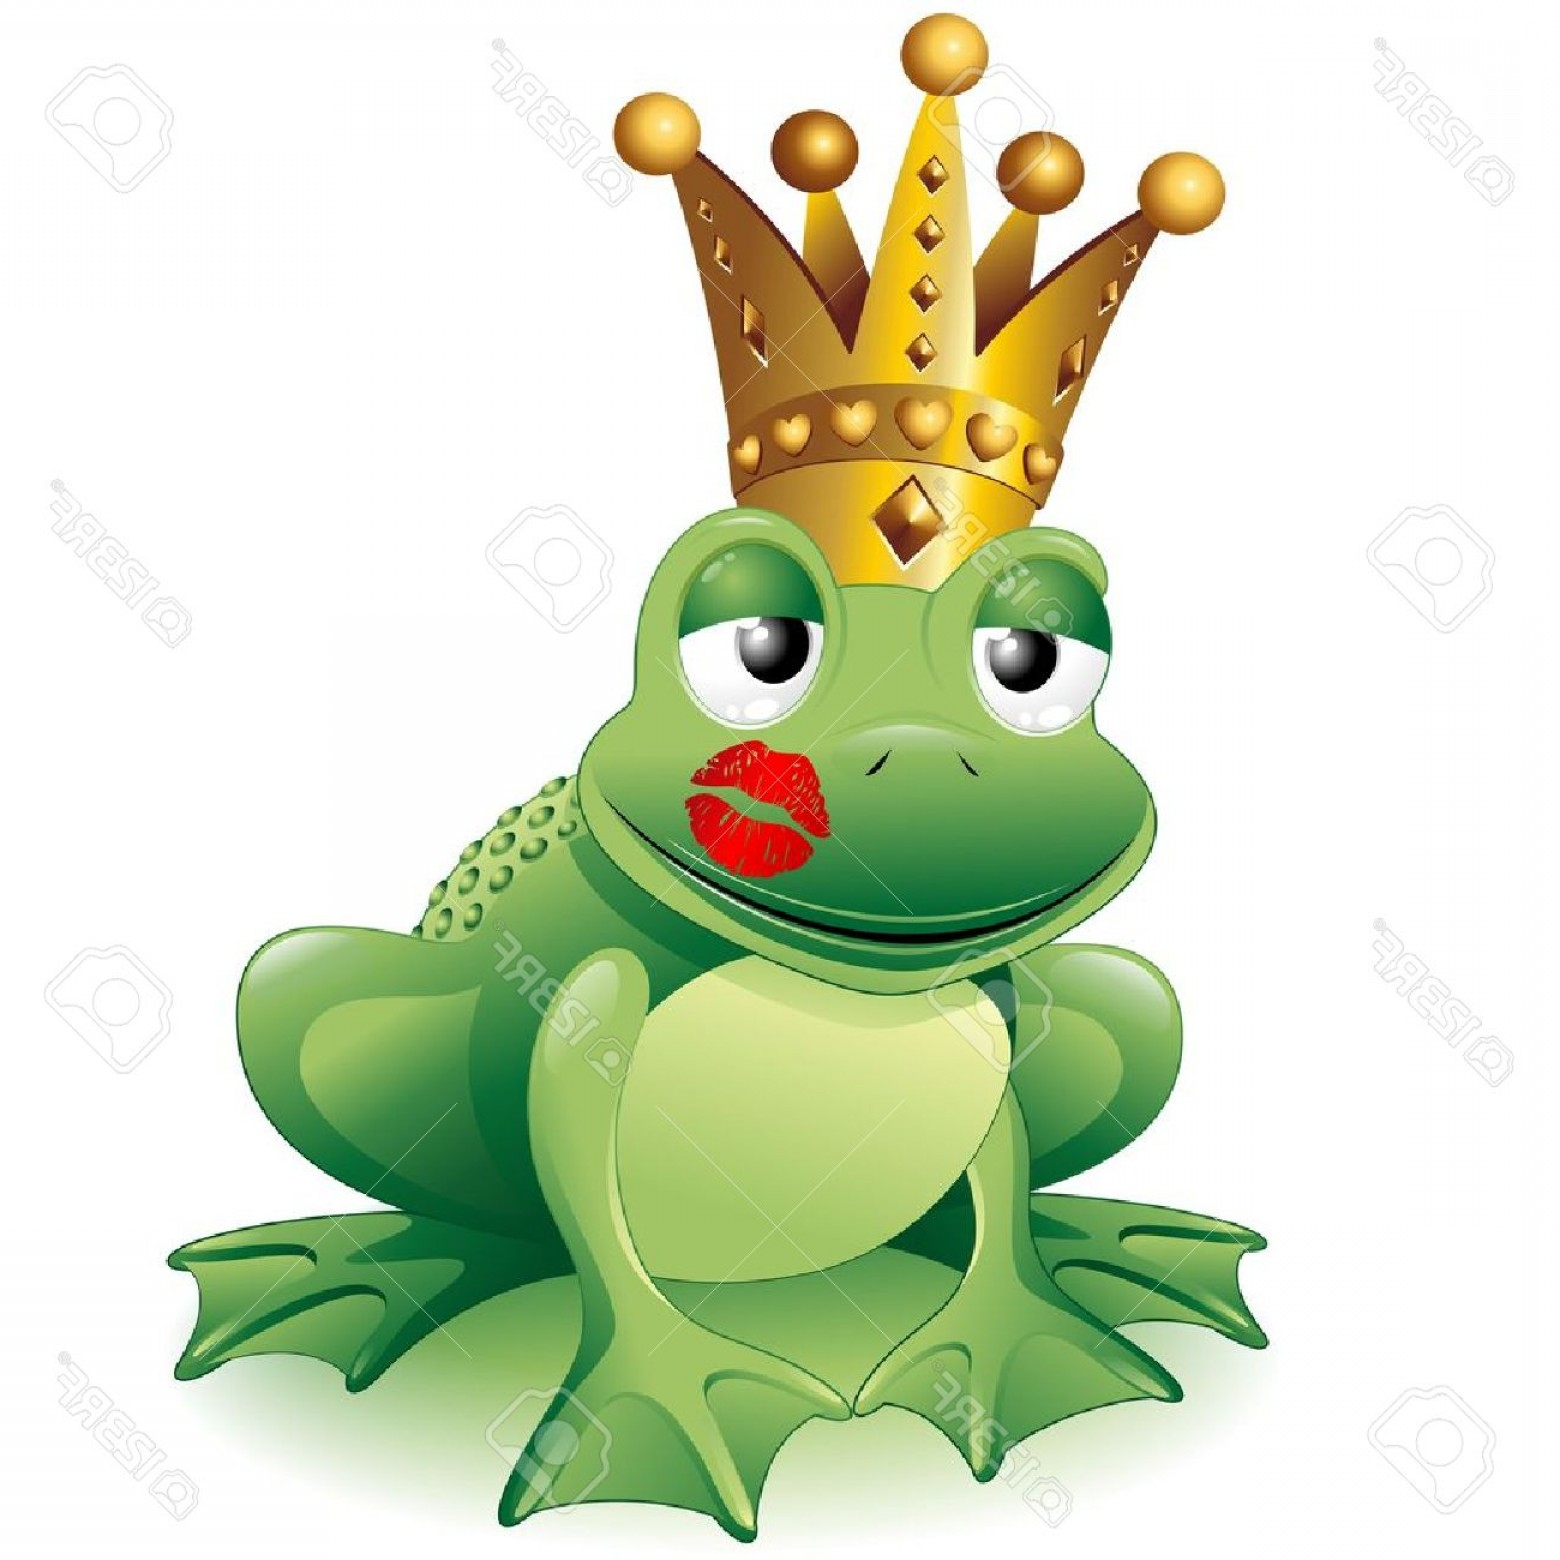 1560x1560 Photoprince Frog Cartoon Clip Art With Princess Kiss Sohadacouri